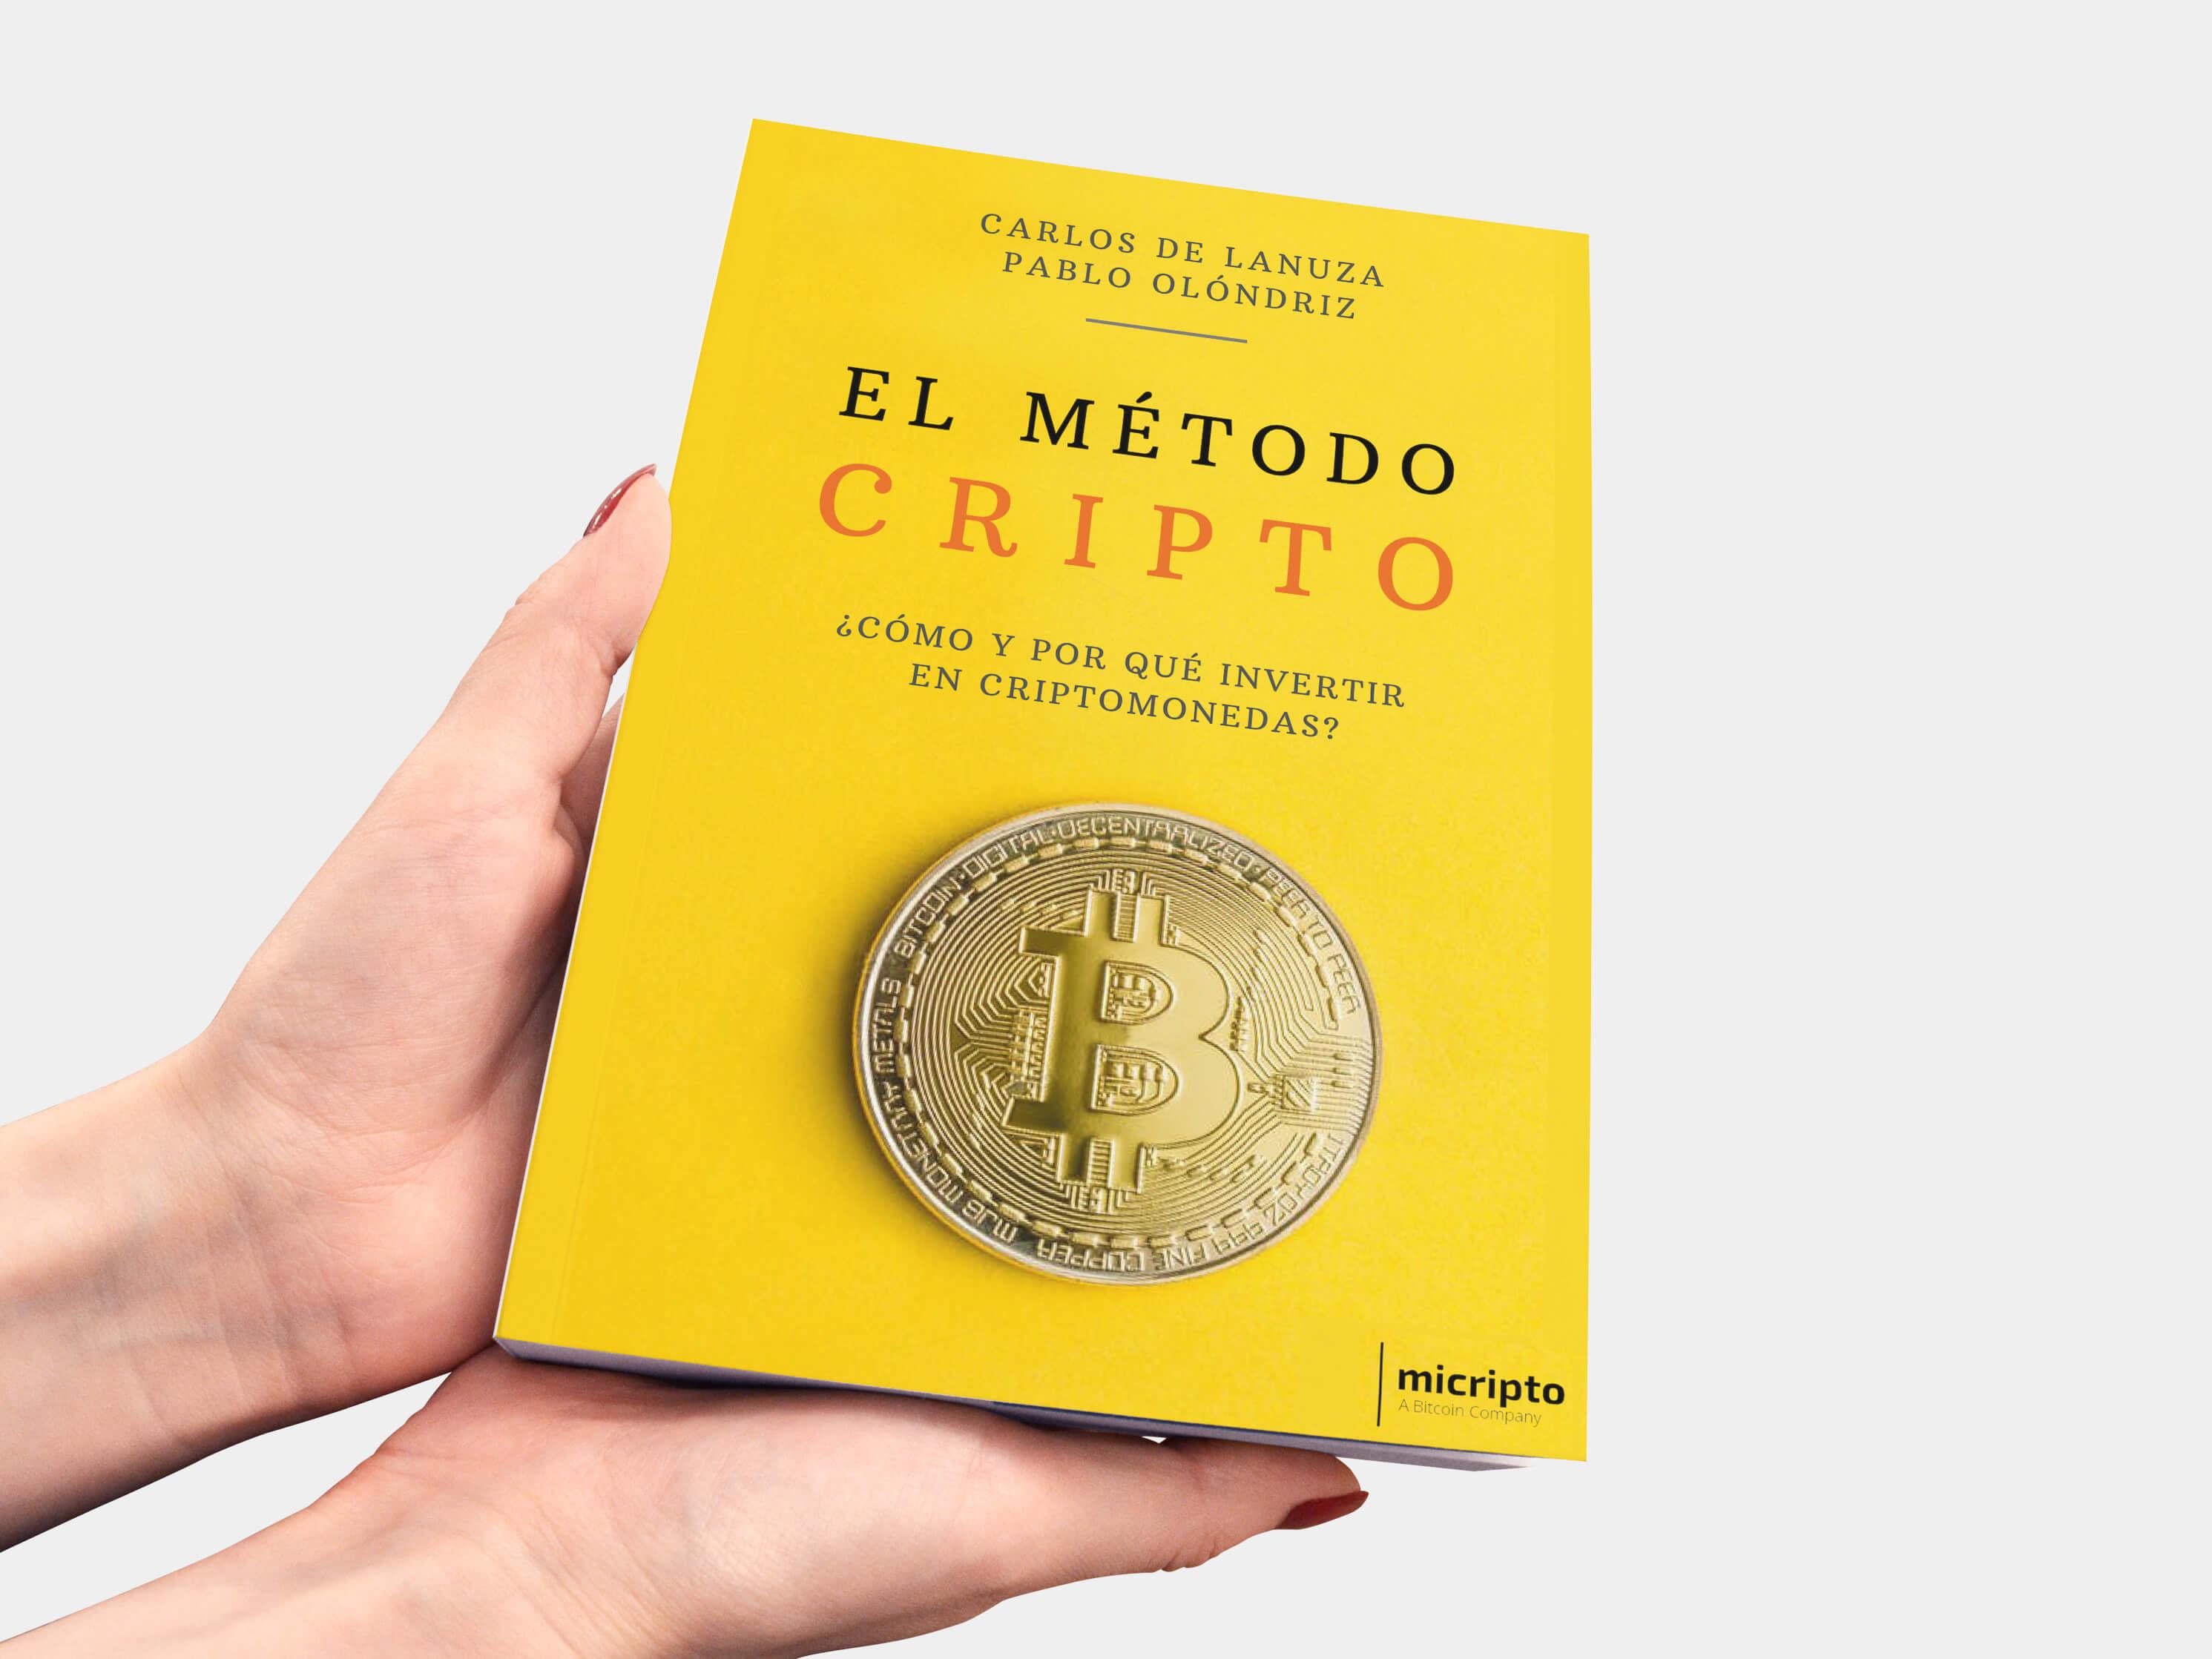 Metodo-S-Cripto